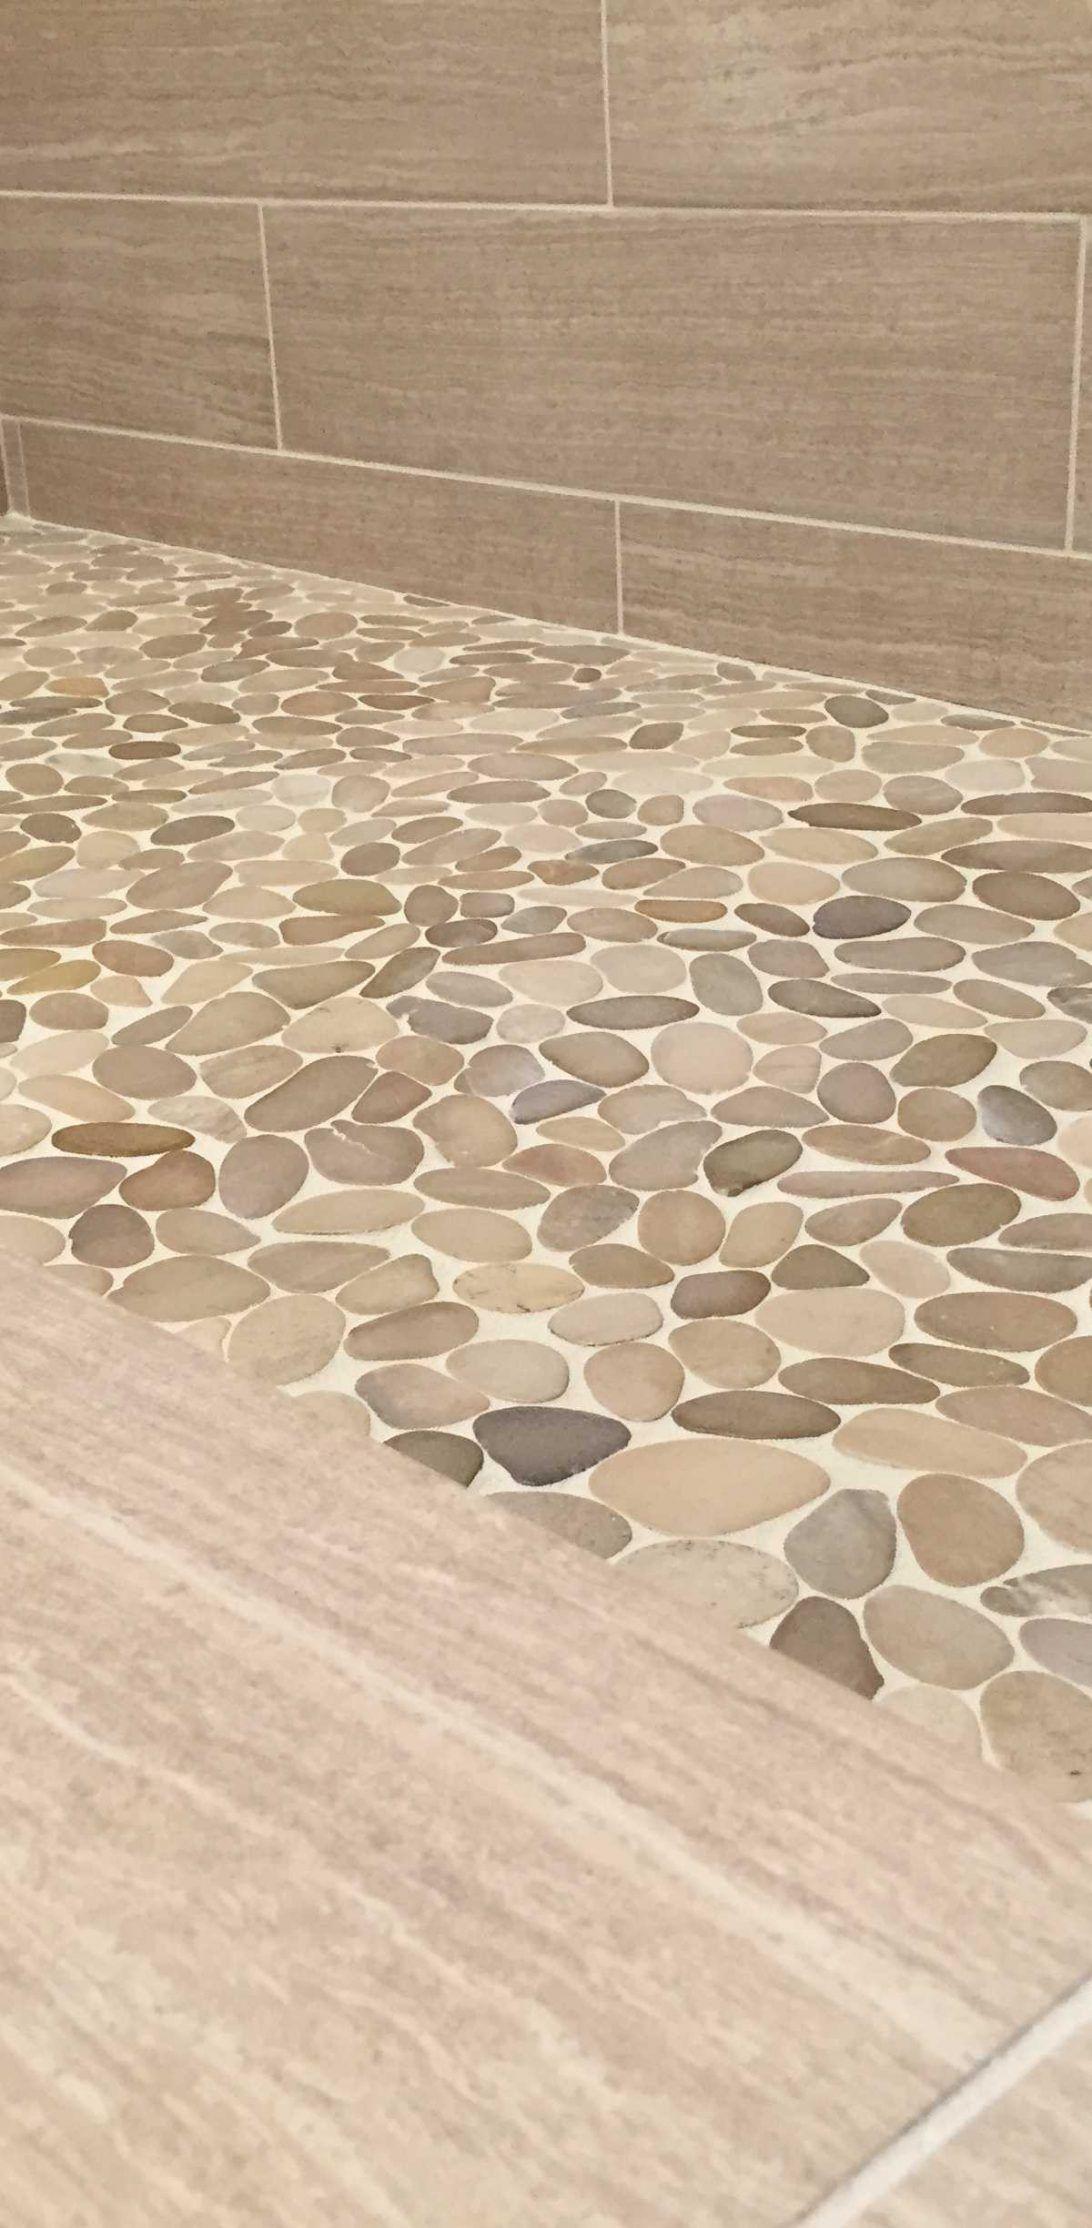 Lowes Pebble Tile Loose Shower Floor Pebble Tile Shower